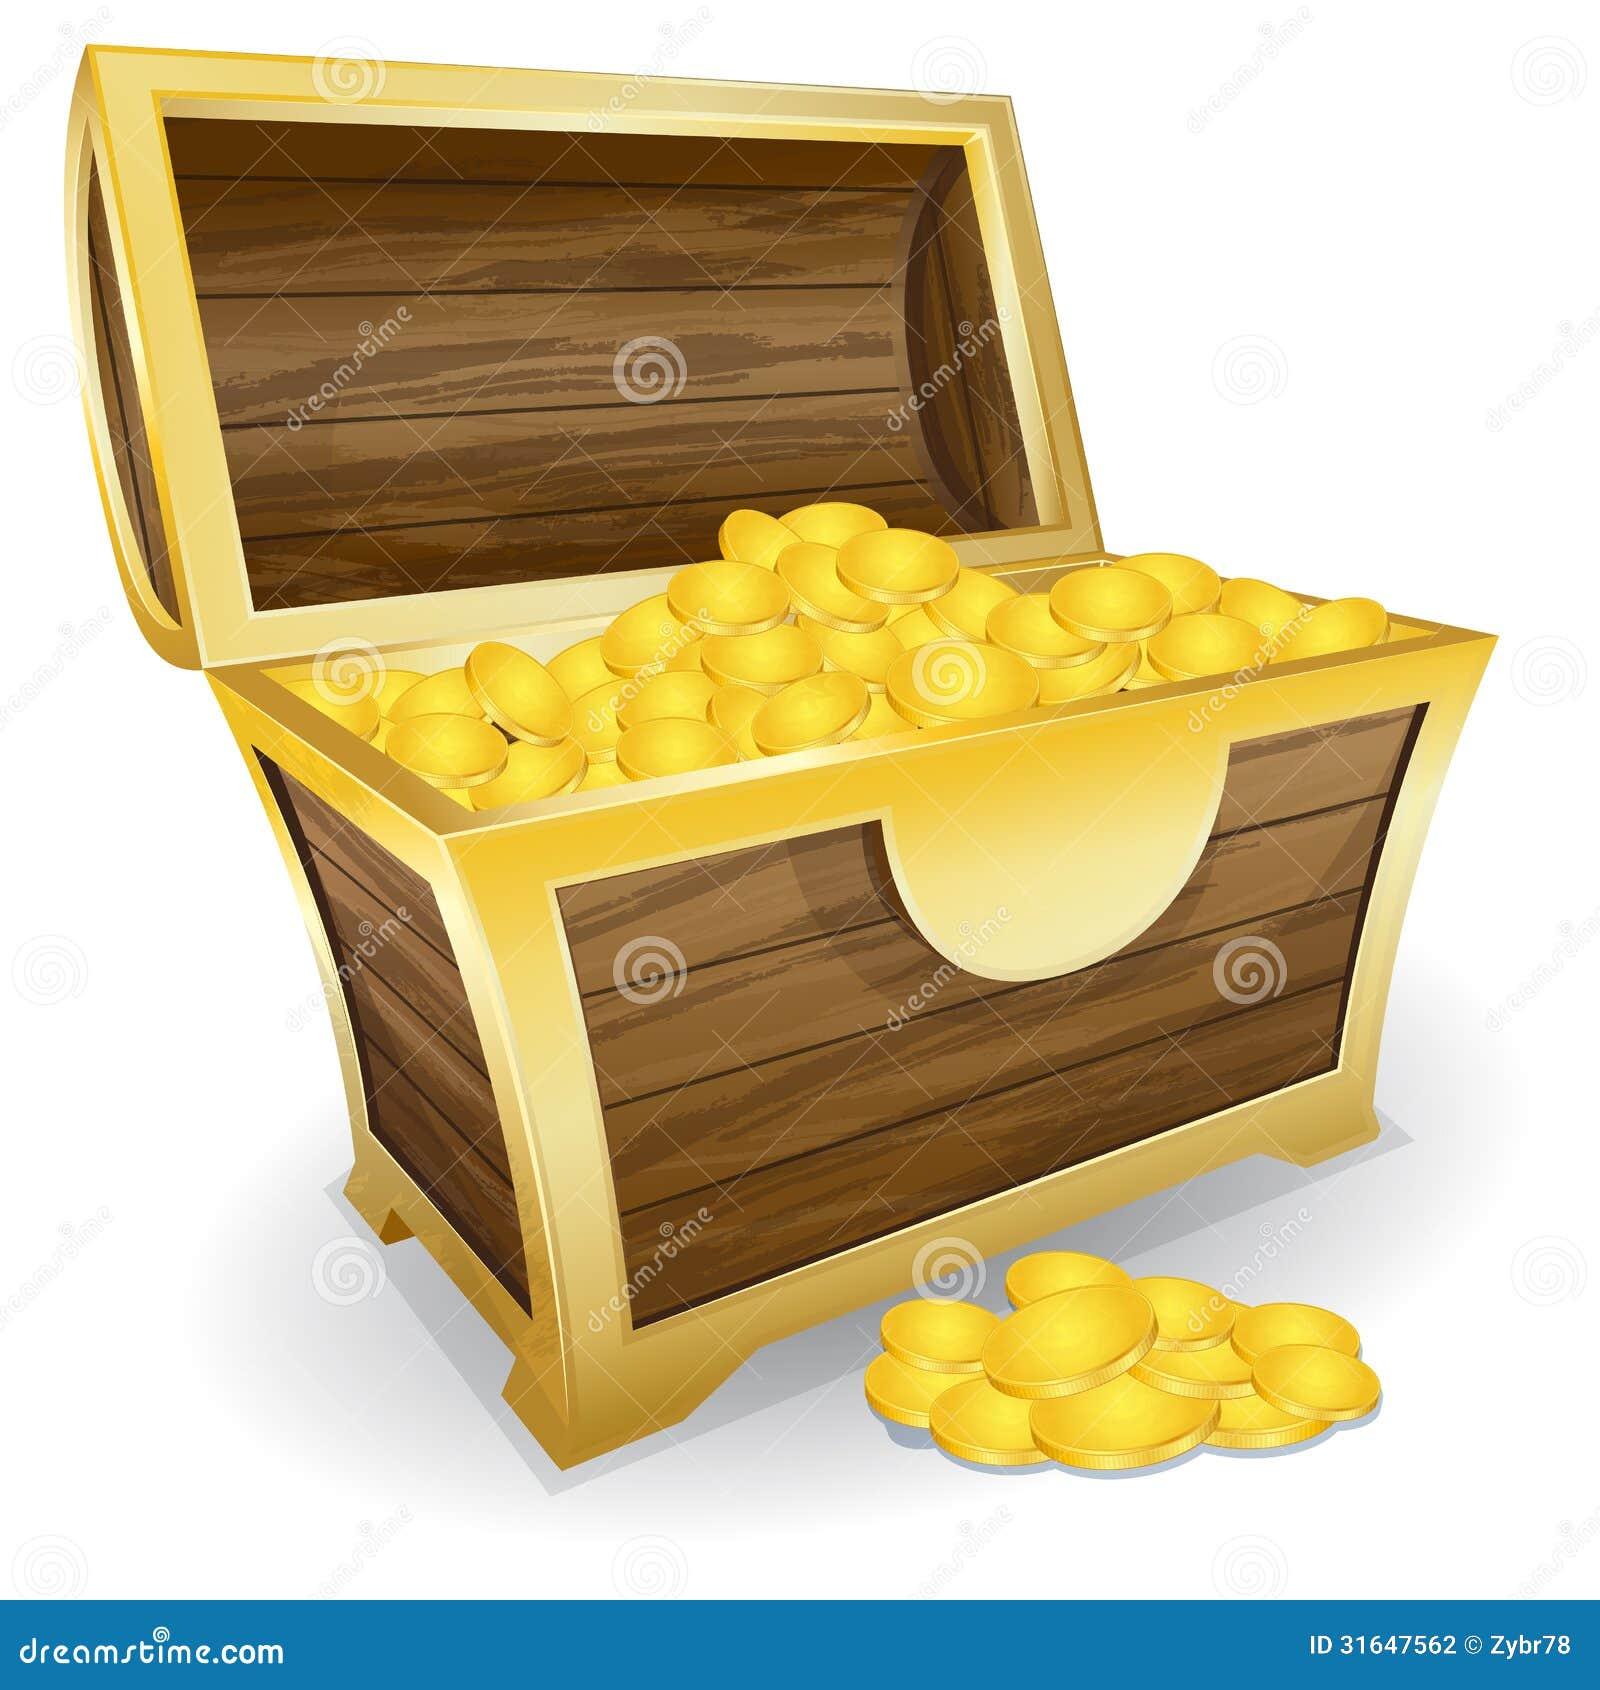 Treasure Chest Stock Photography - Image: 31647562